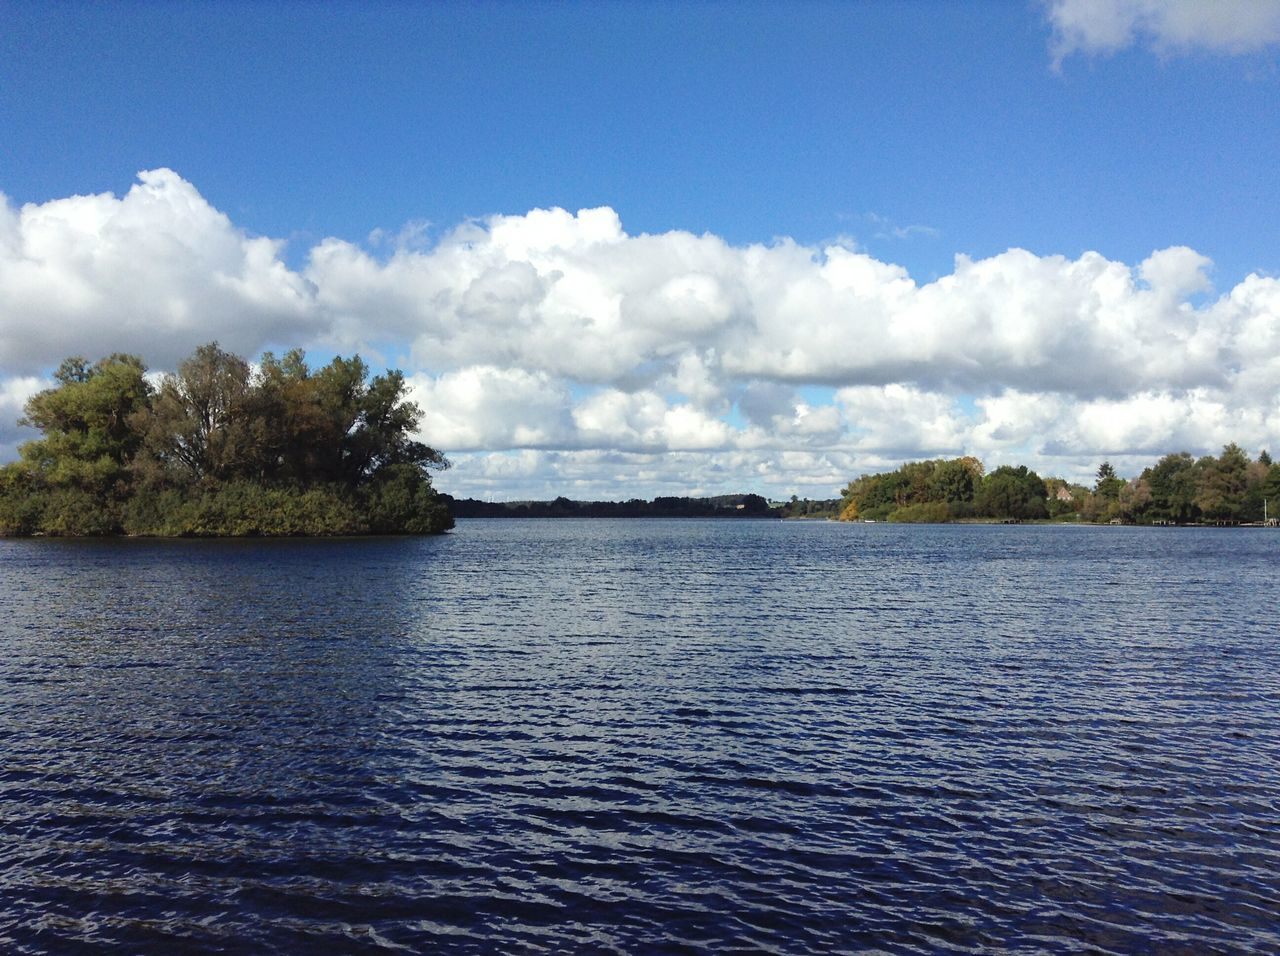 Lake near Plön. · Germany Schleswig-Holstein Norddeutschland Water Waterfront Rippled Nature Landscape Island Trees Green Blue Sky Outdoors No People